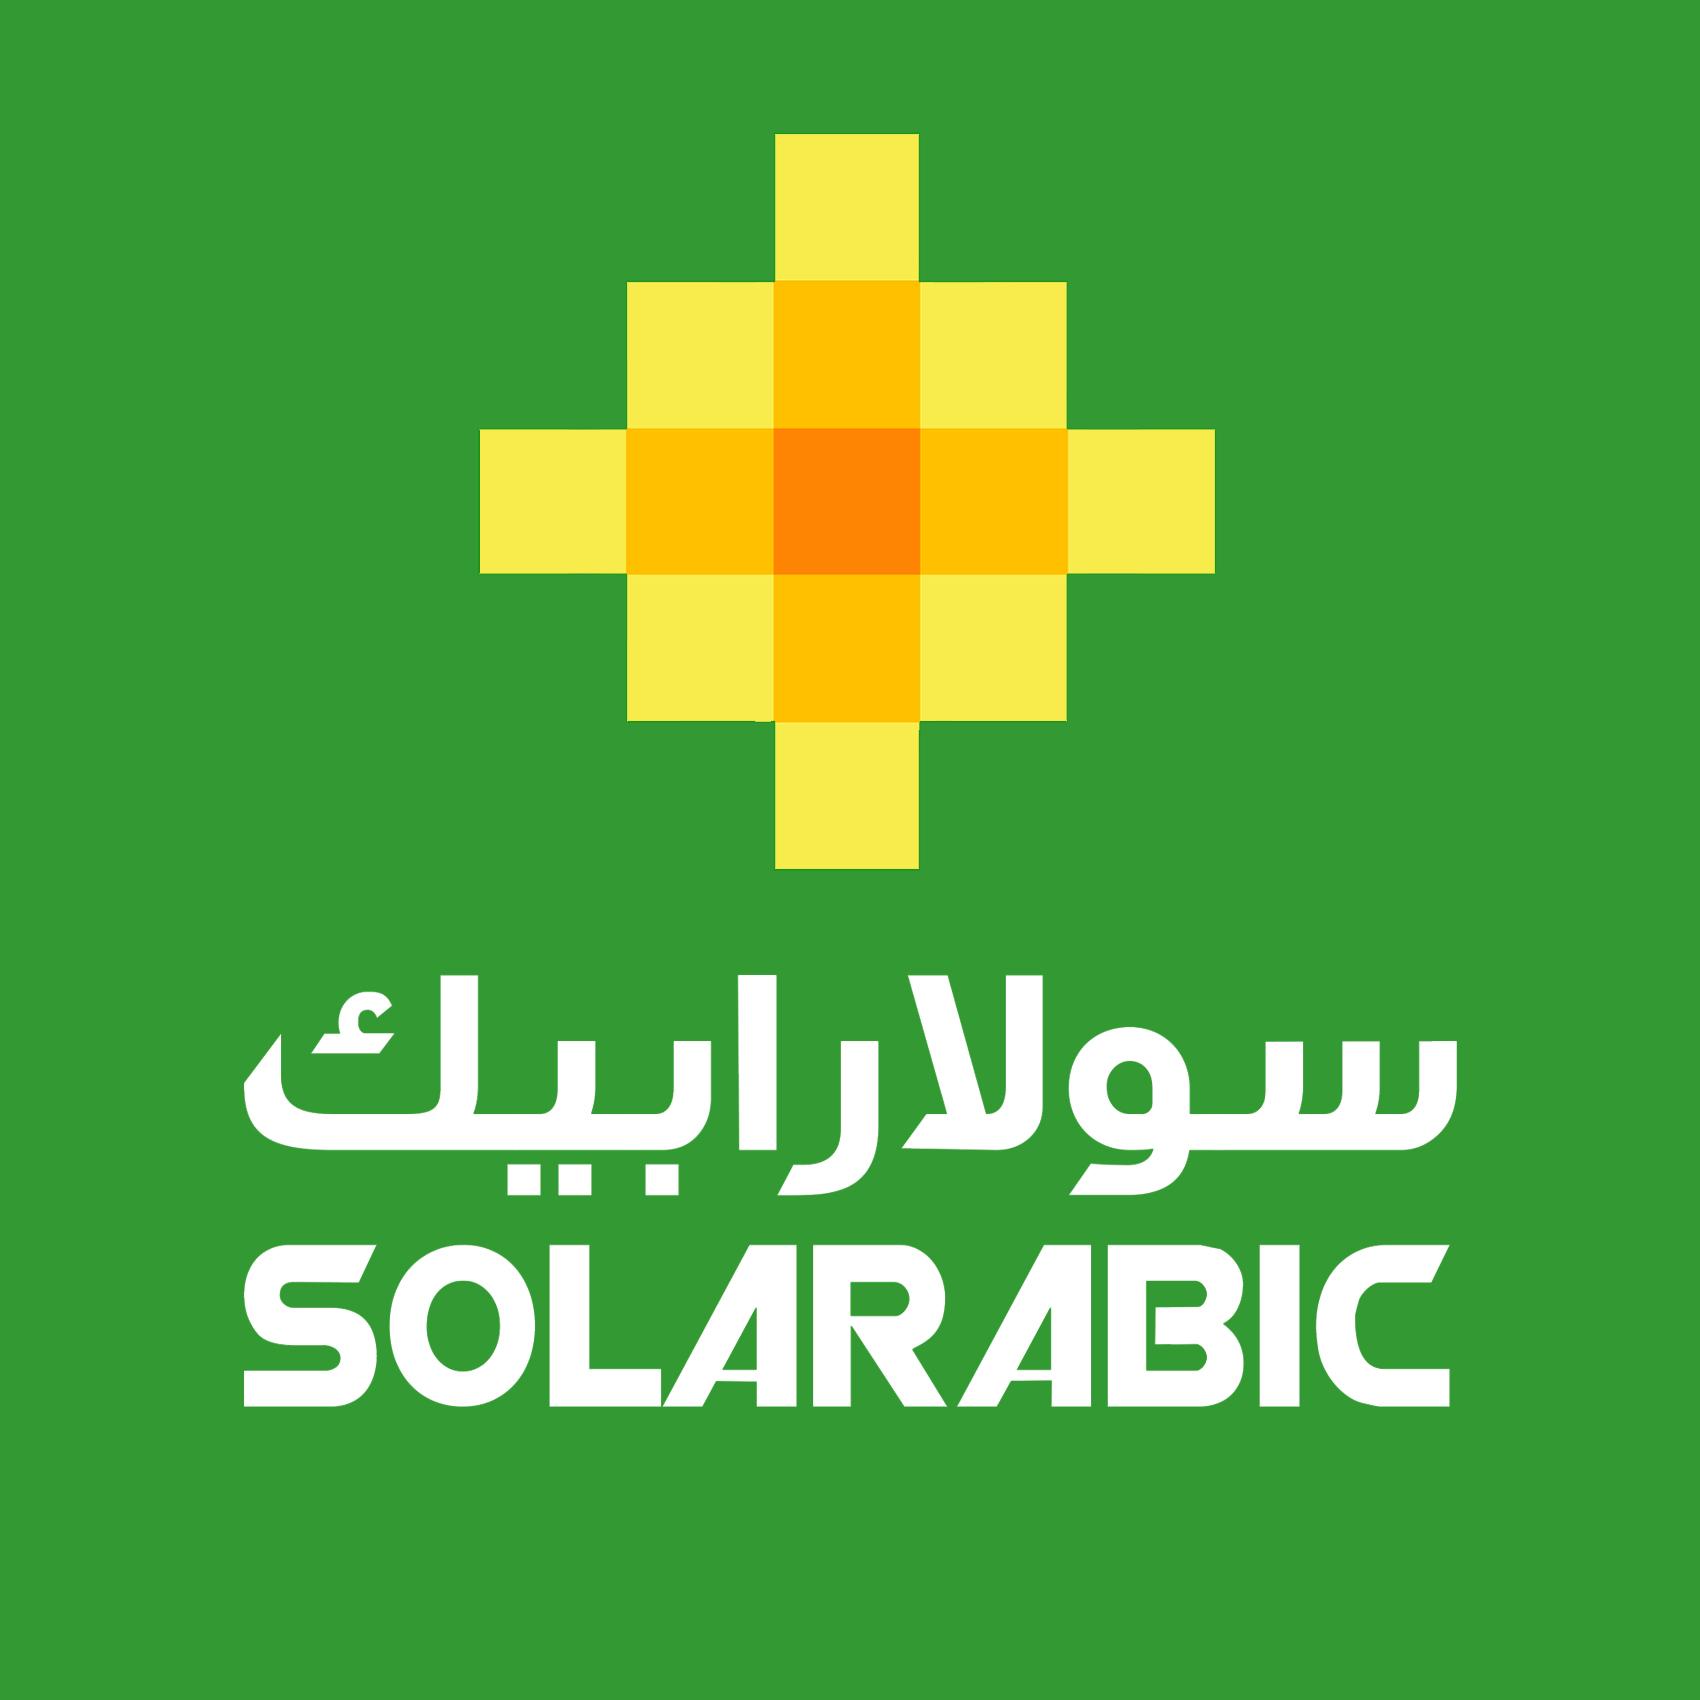 Solarabic